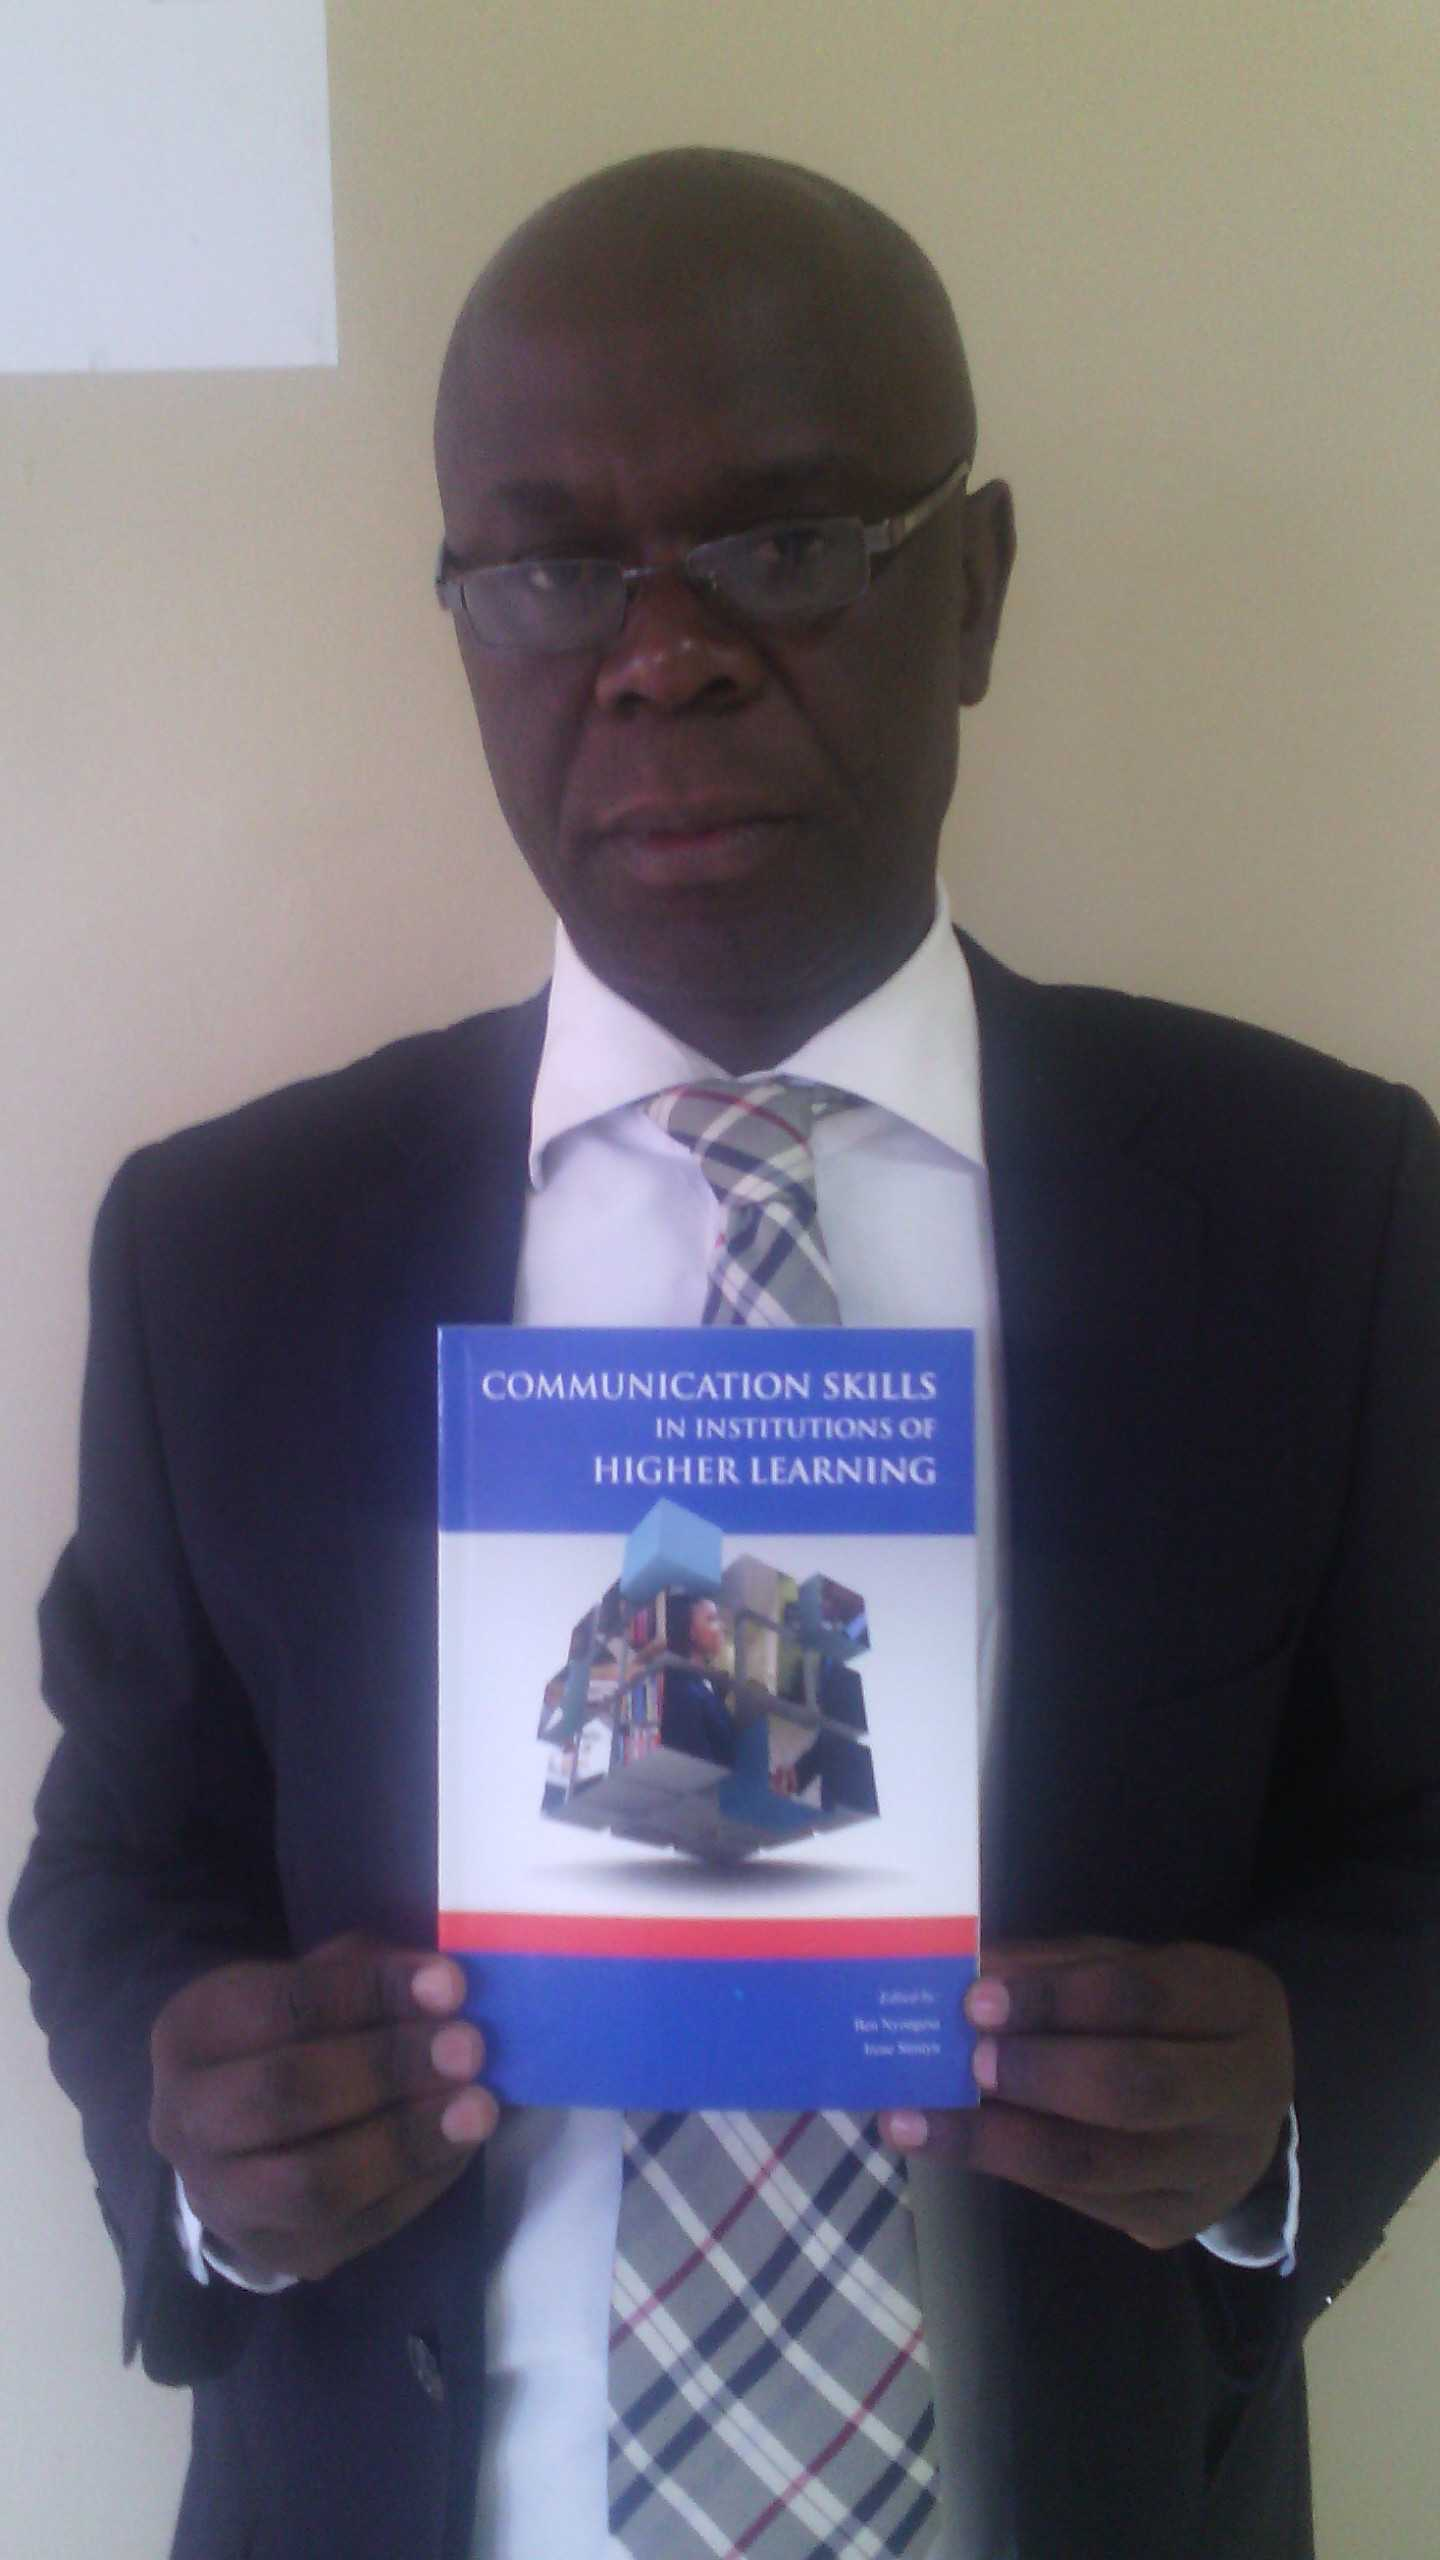 Book:Communication Skills